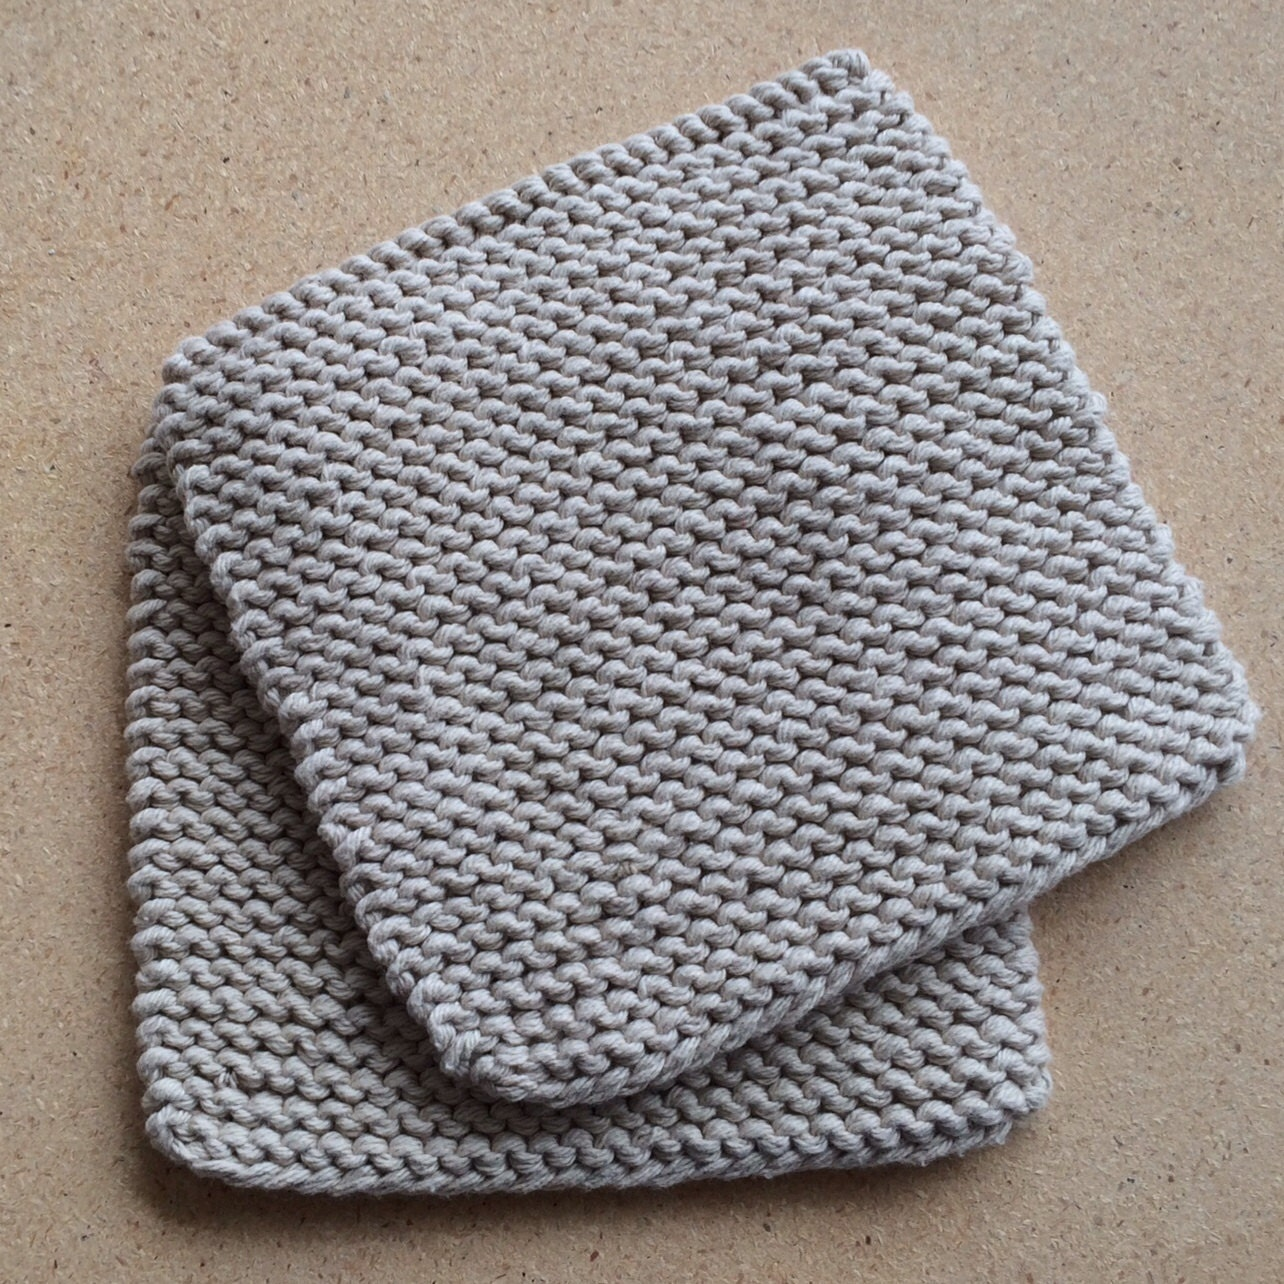 Hand Knit Cotton Pot Holders Set of 2 Gray